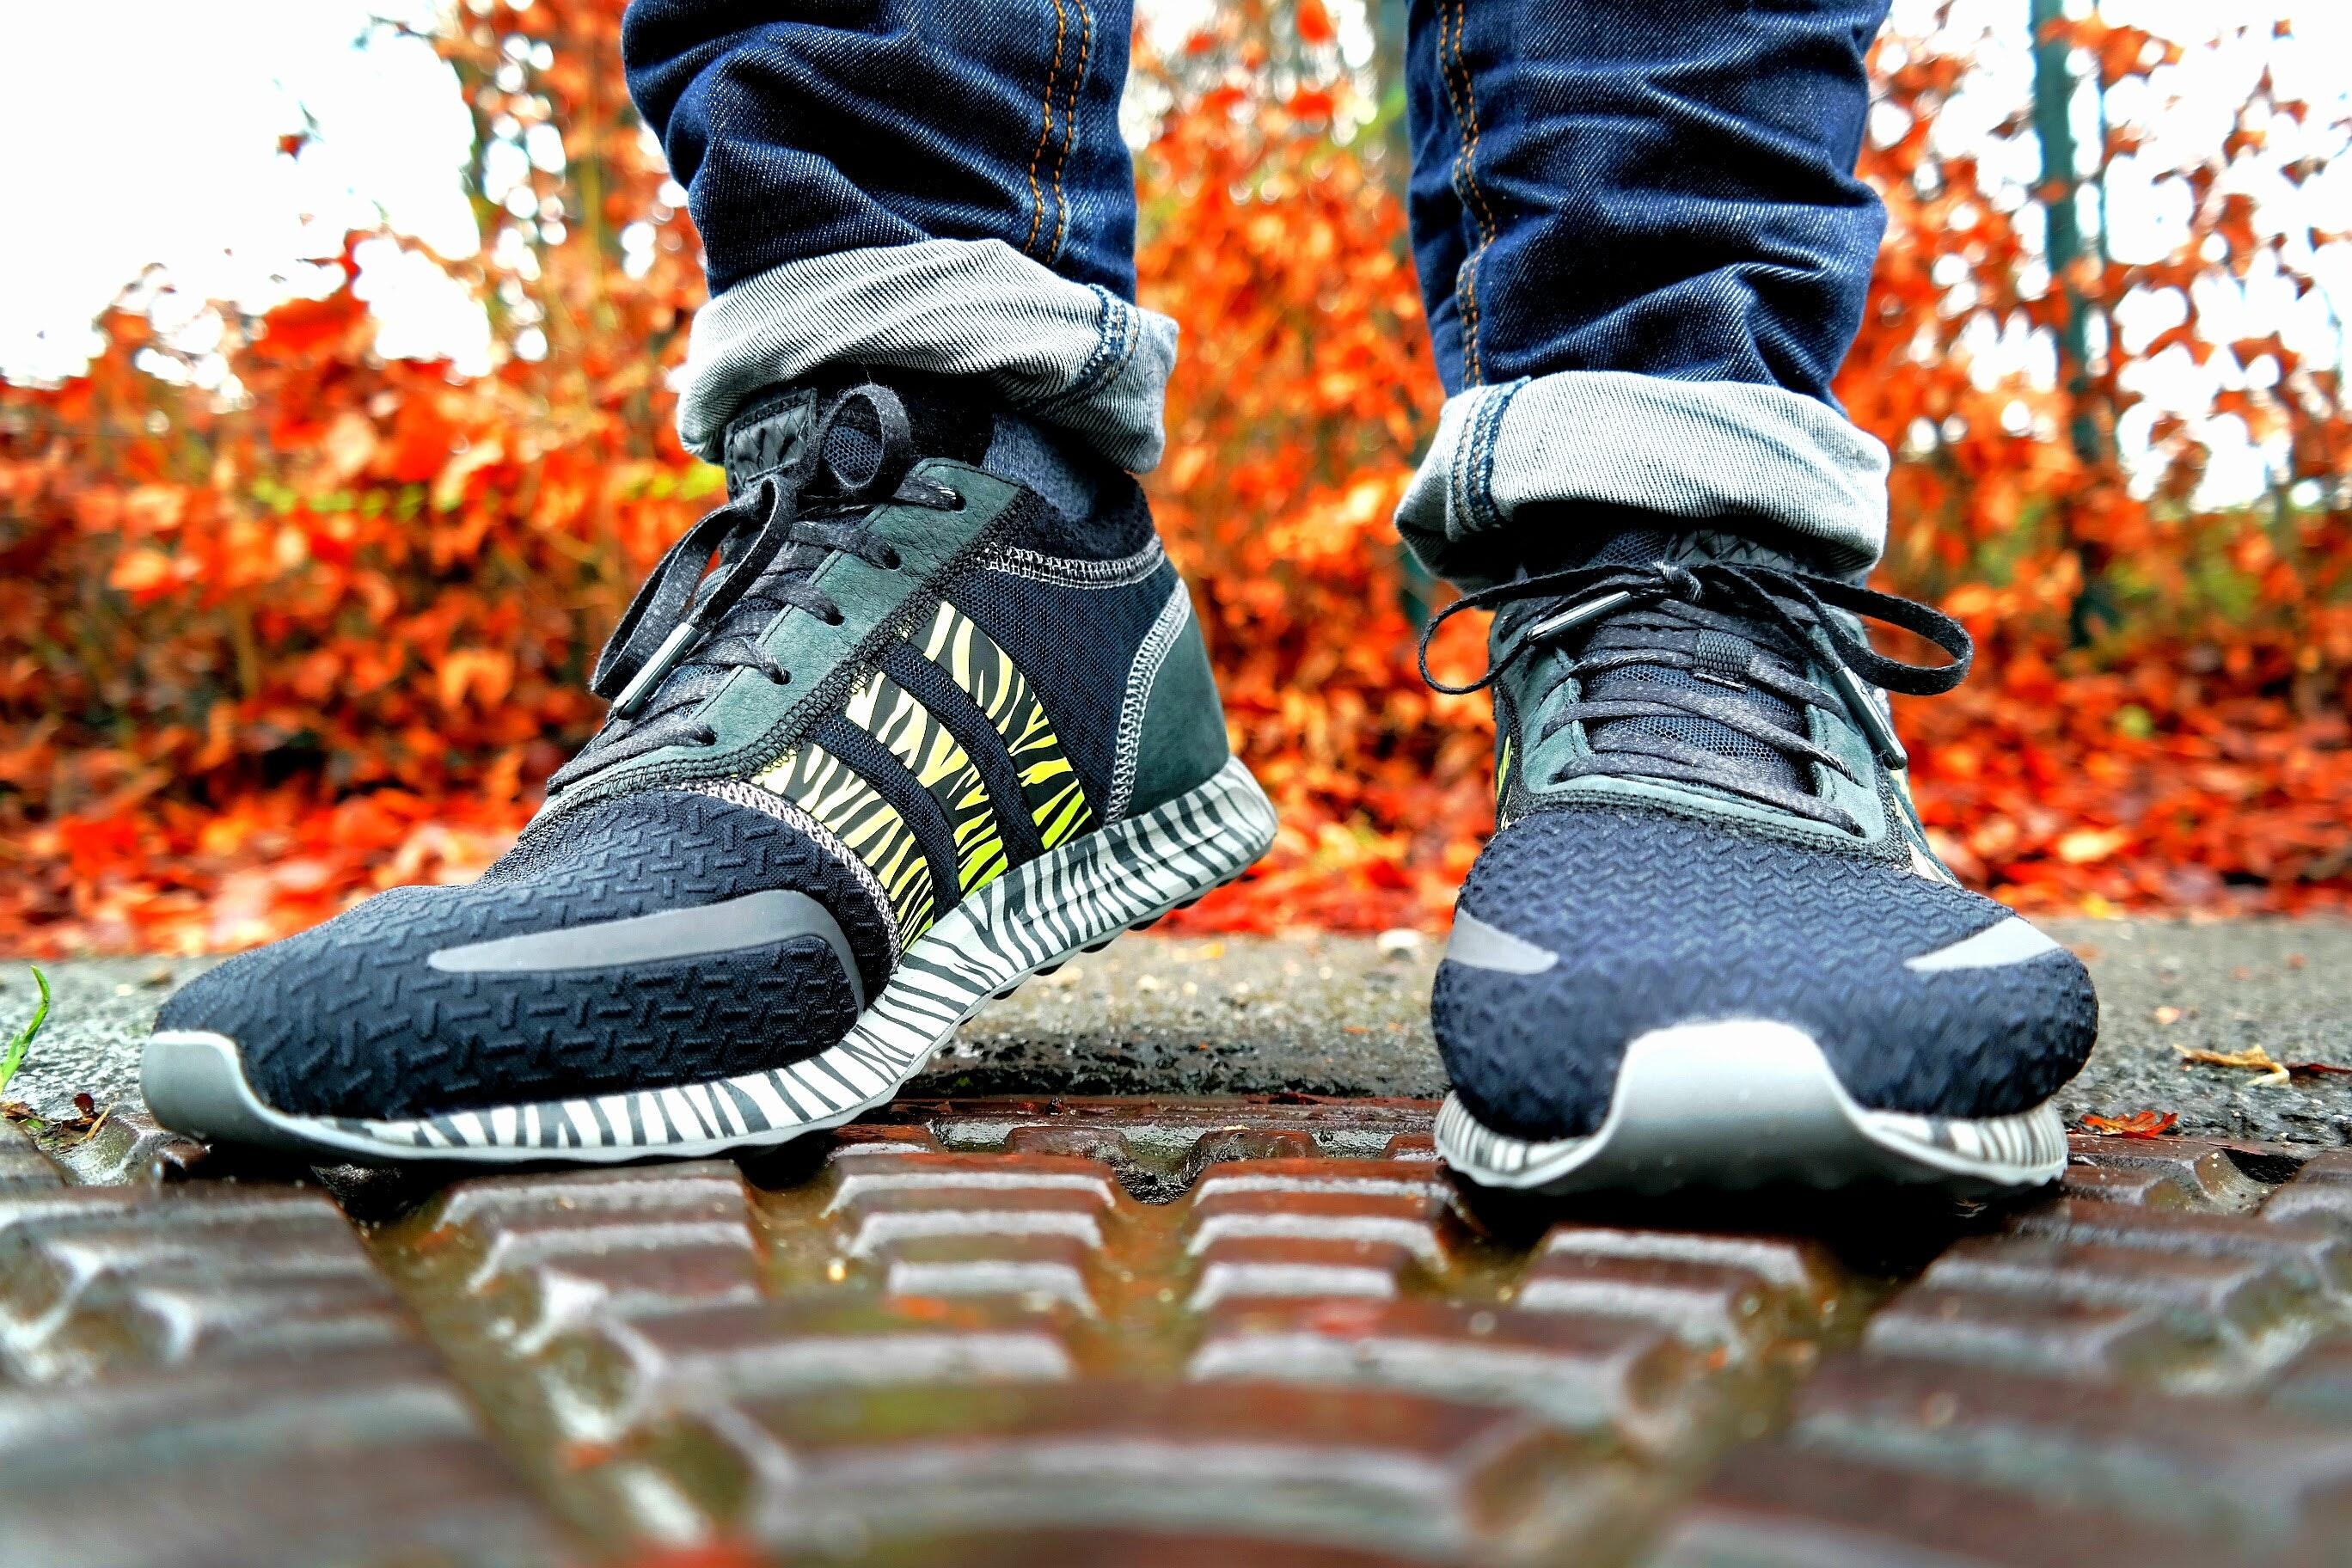 f0270a969fc Free stock photo of casual, αθλητικά παπούτσια, κορδόνια